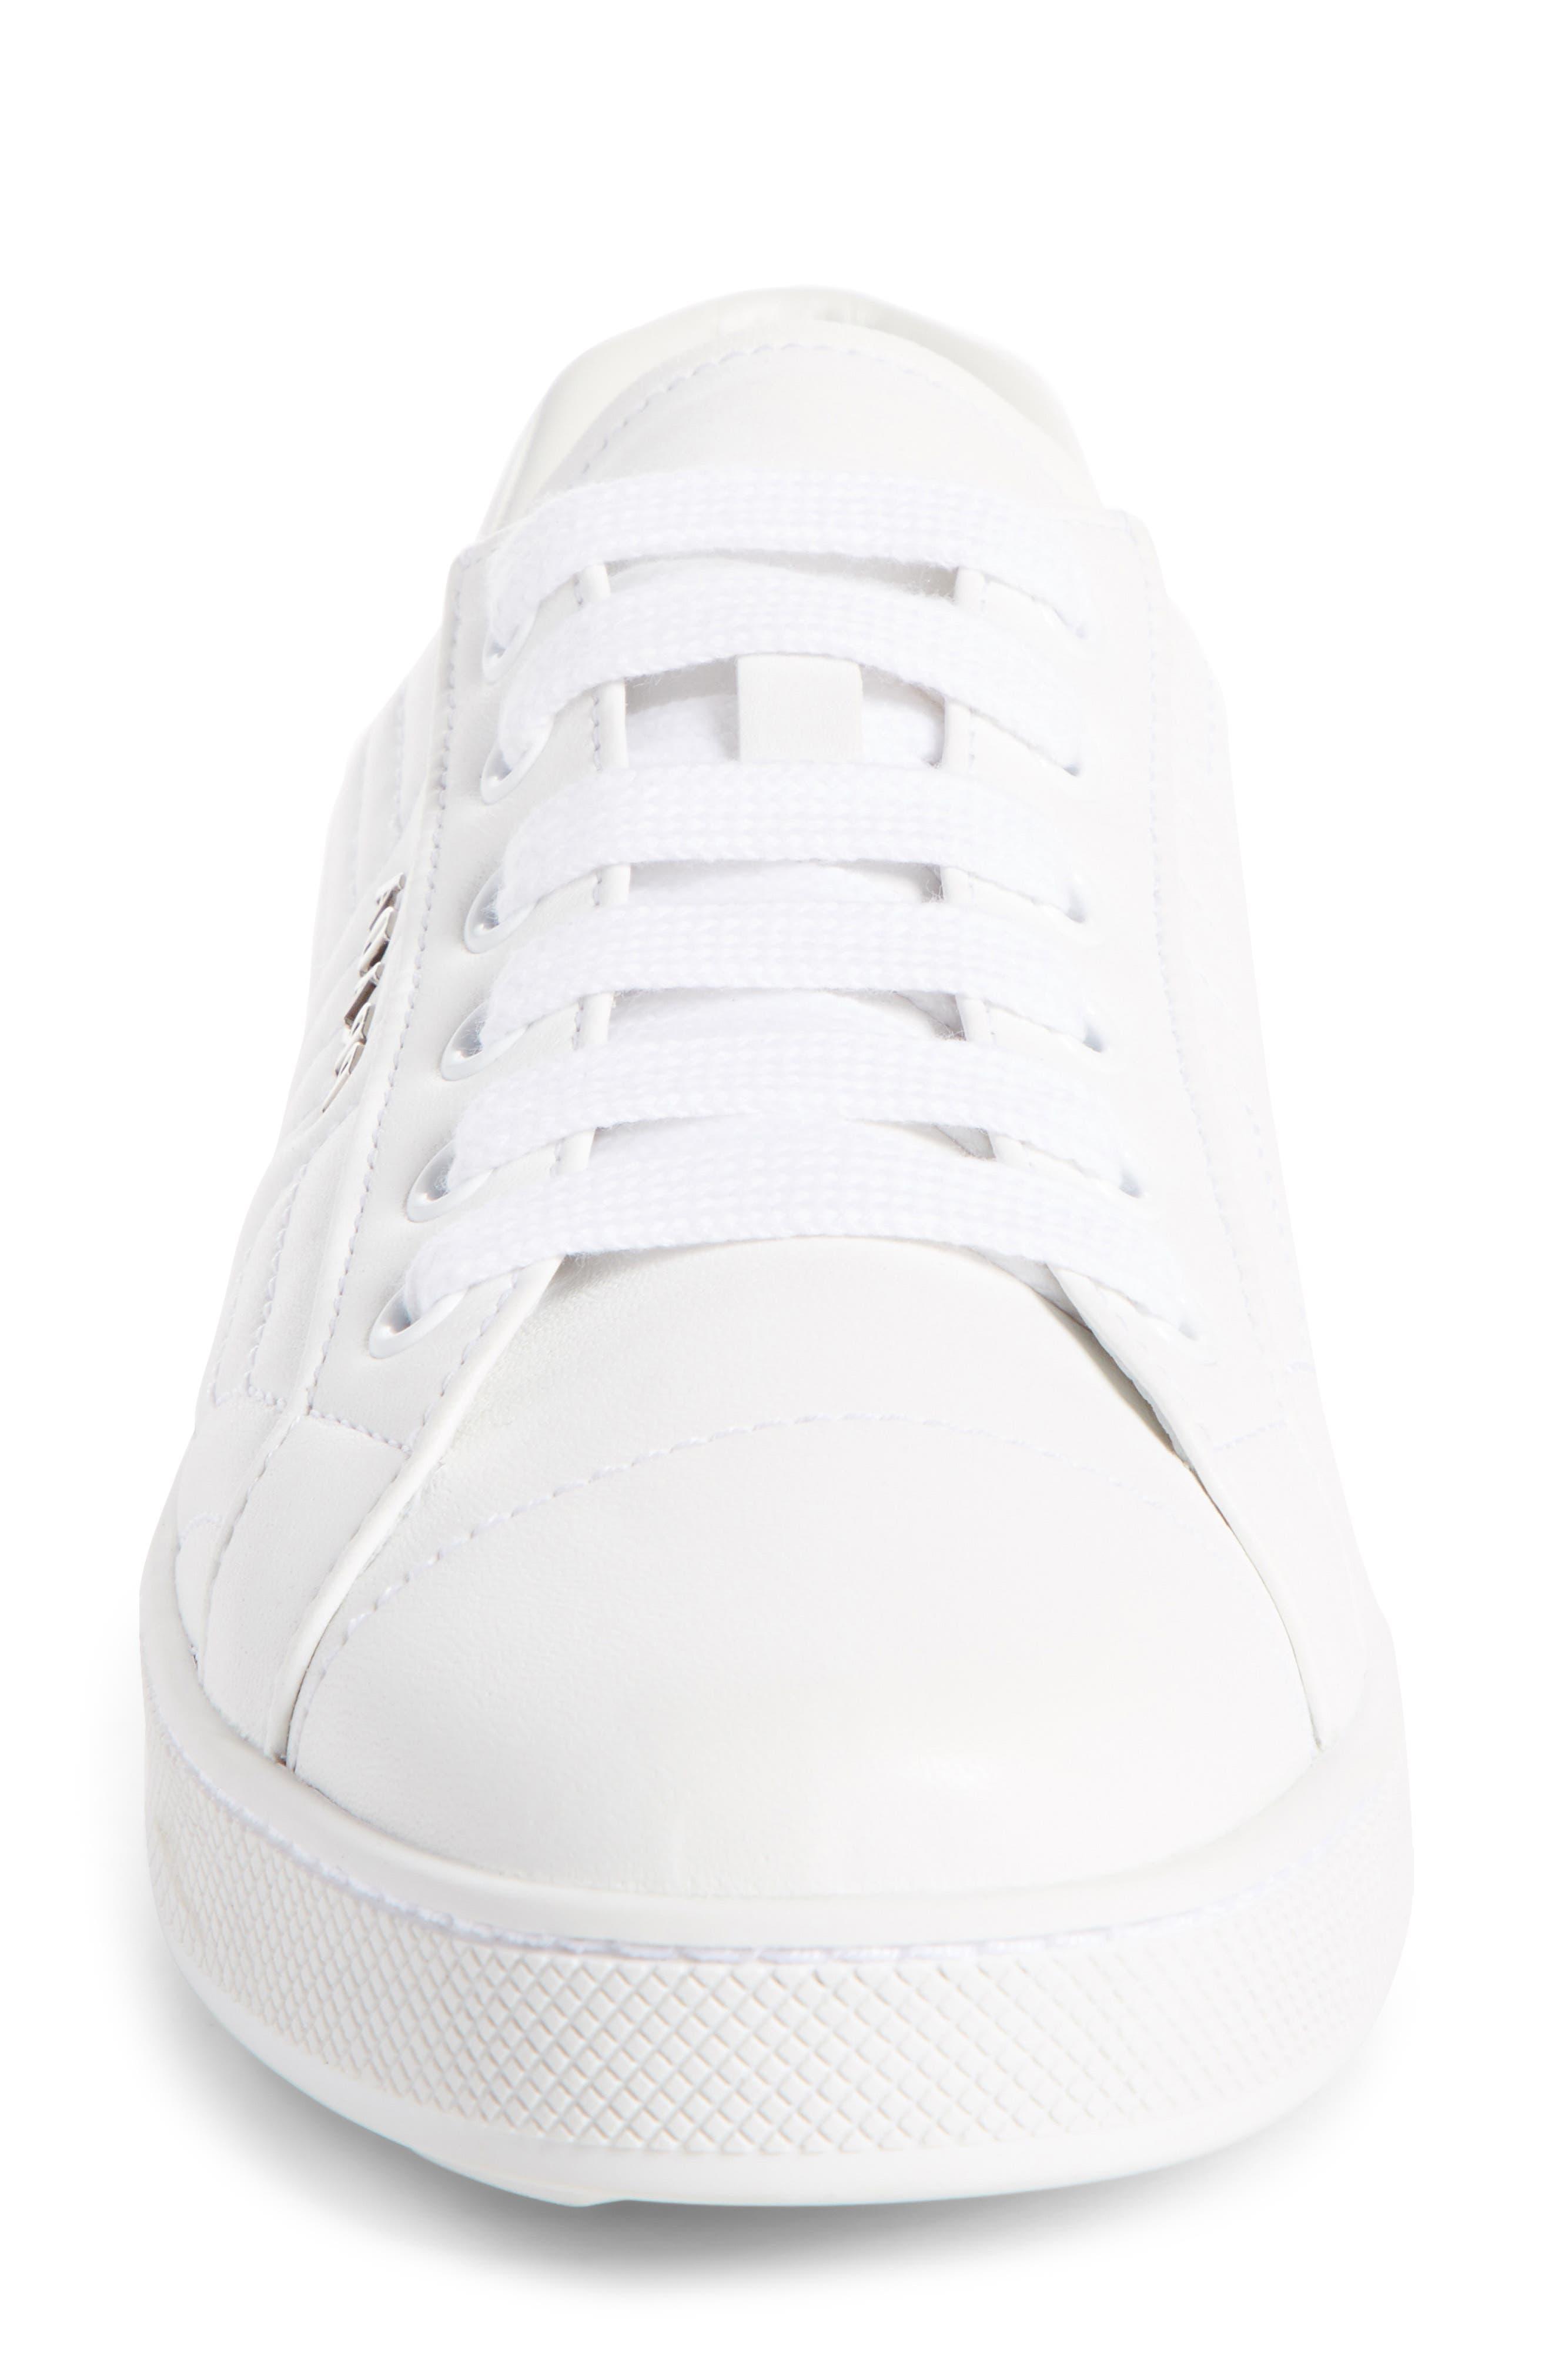 Alternate Image 3  - Prada Quilted Leather Sneaker (Women)